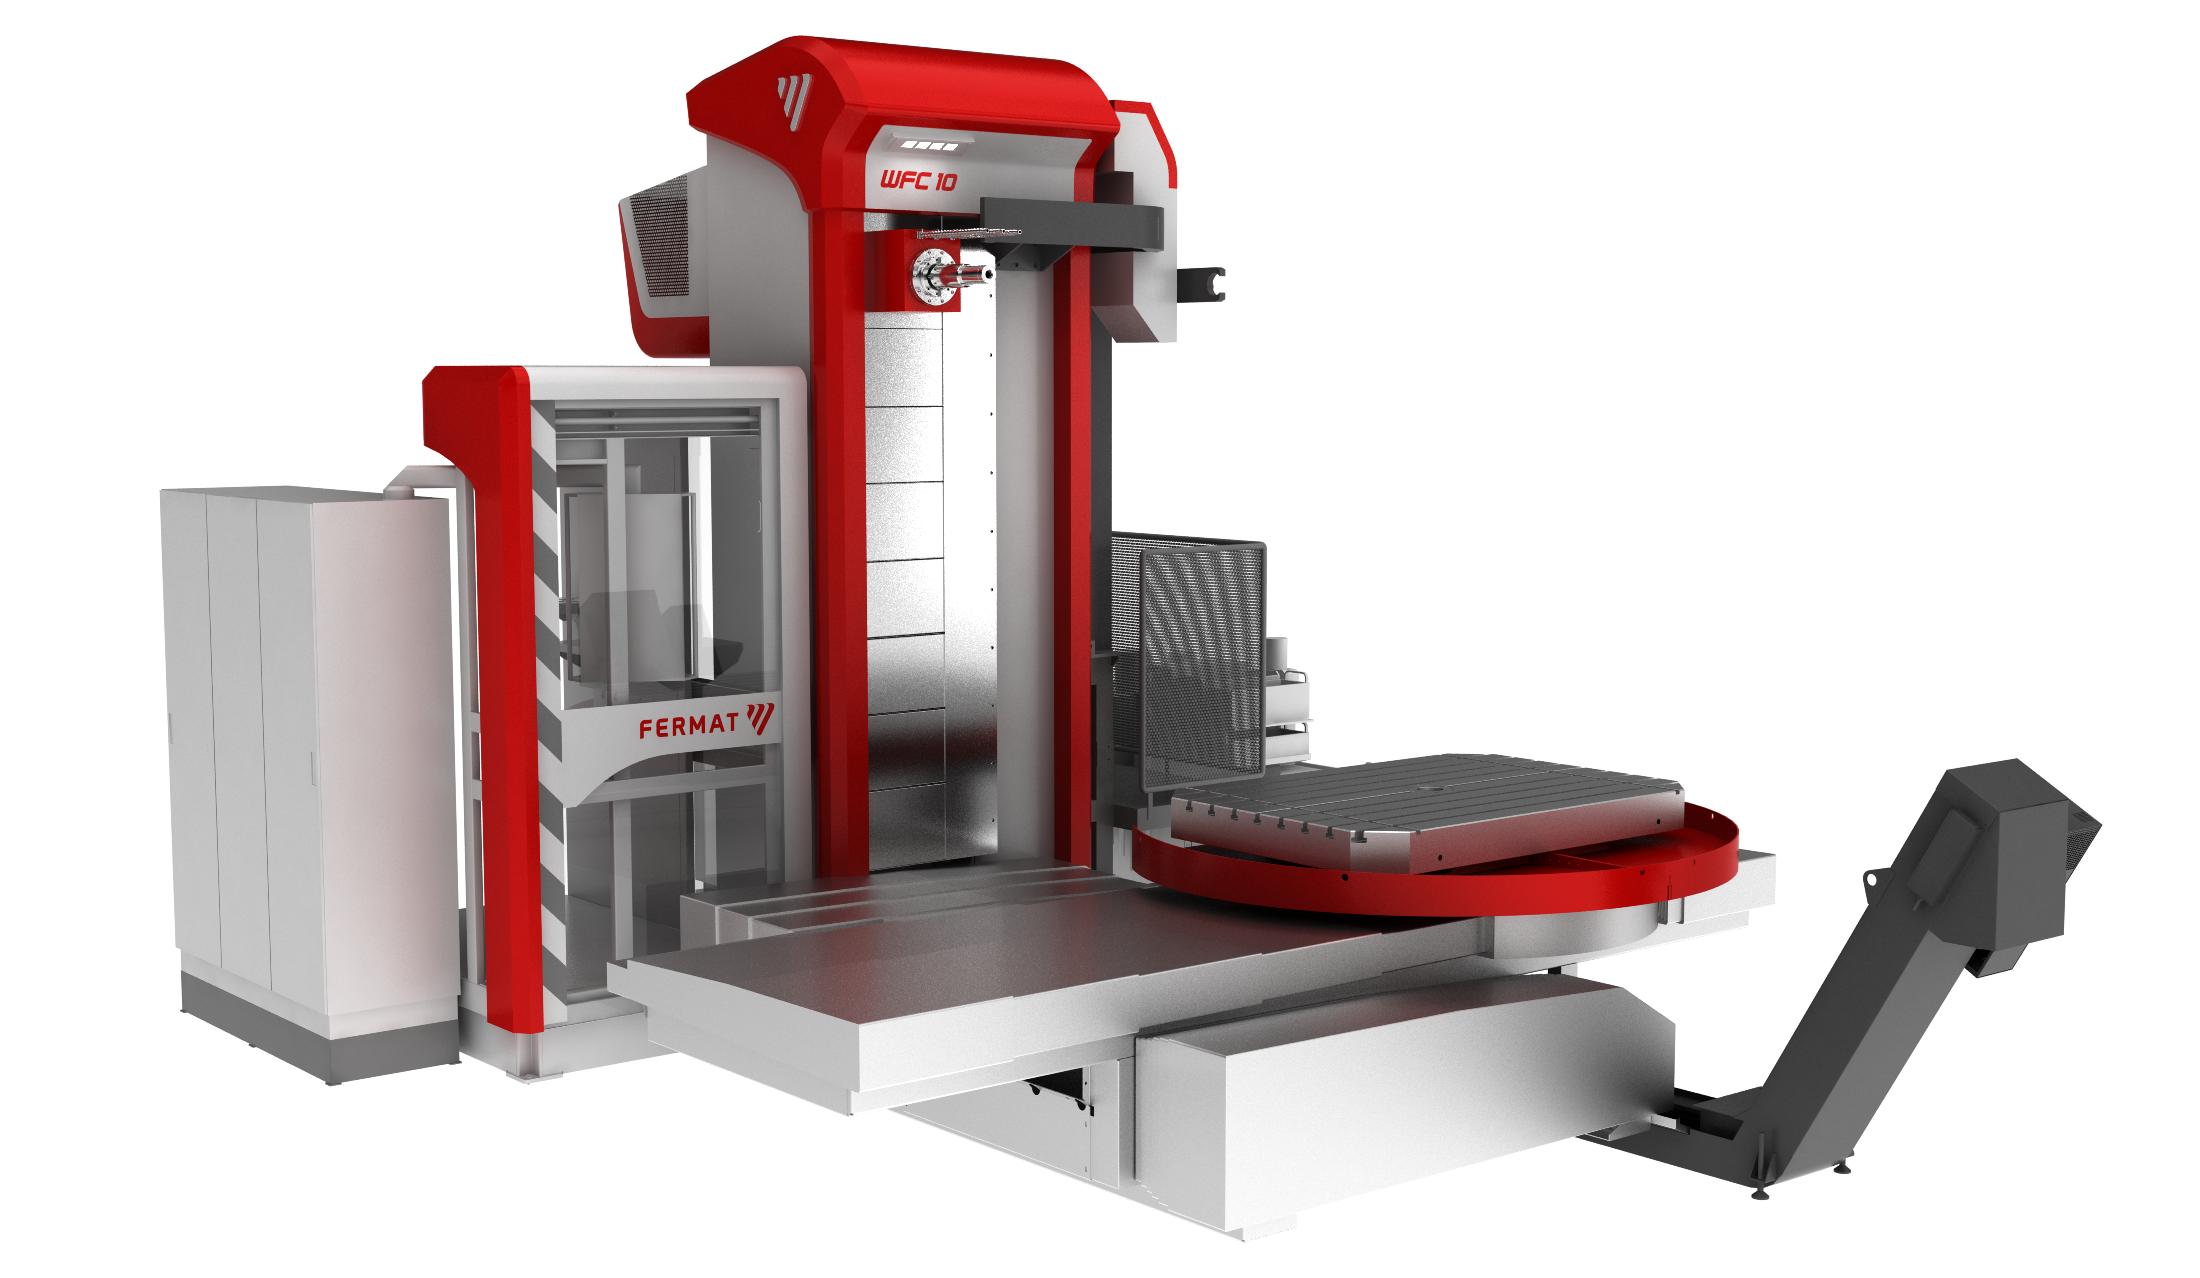 WFC 10 - horizontal table-type boring mill - Image